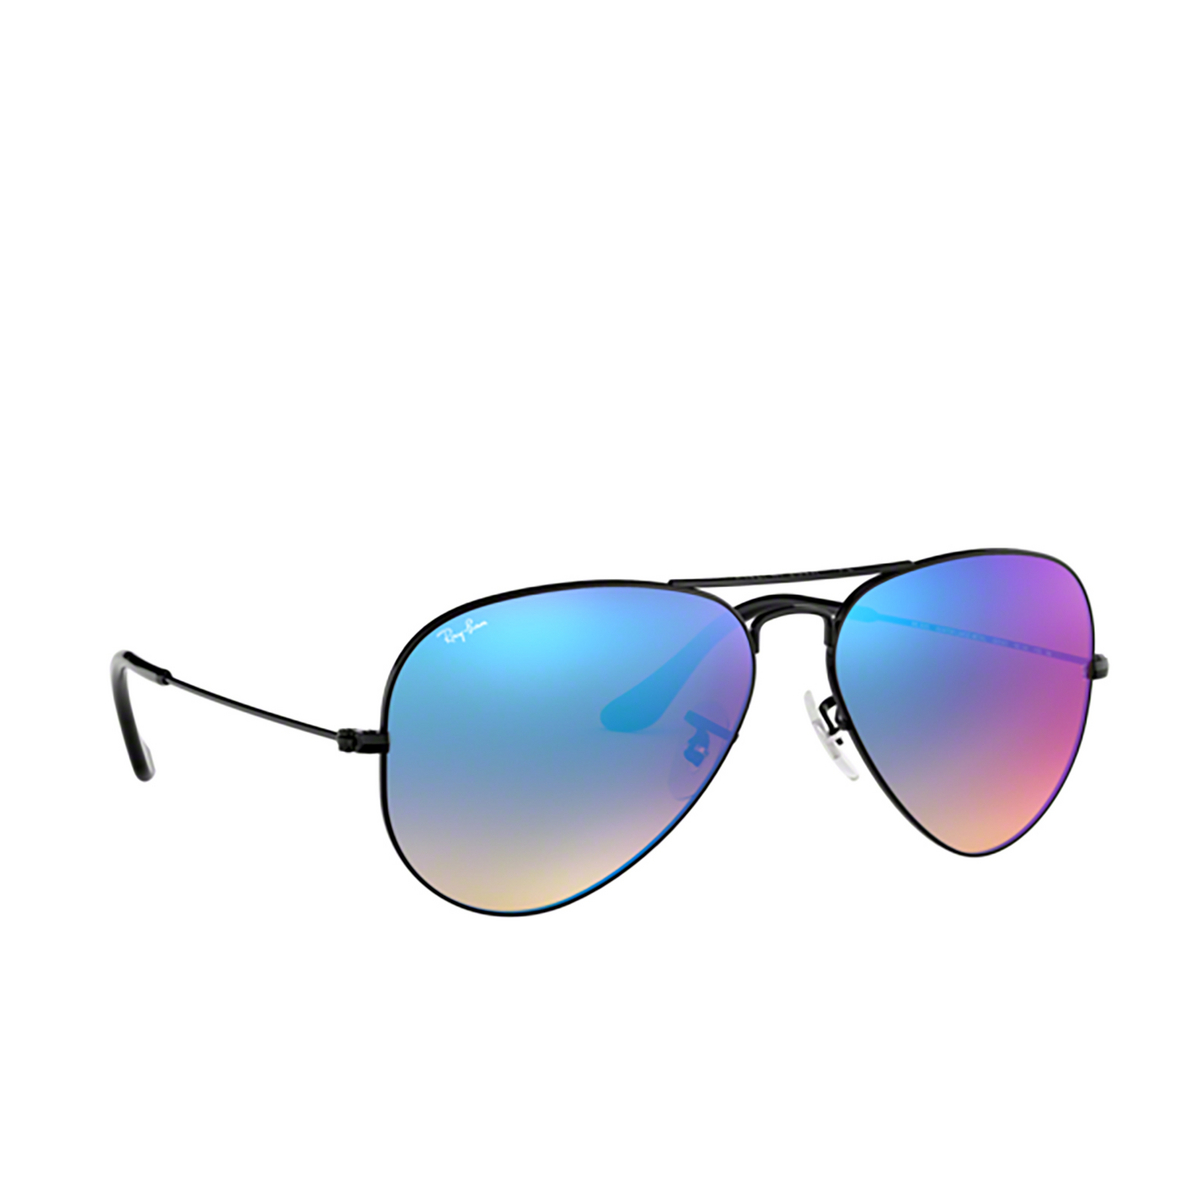 Ray-Ban® Aviator Sunglasses: Aviator Large Metal RB3025 color Black 002/4O - three-quarters view.